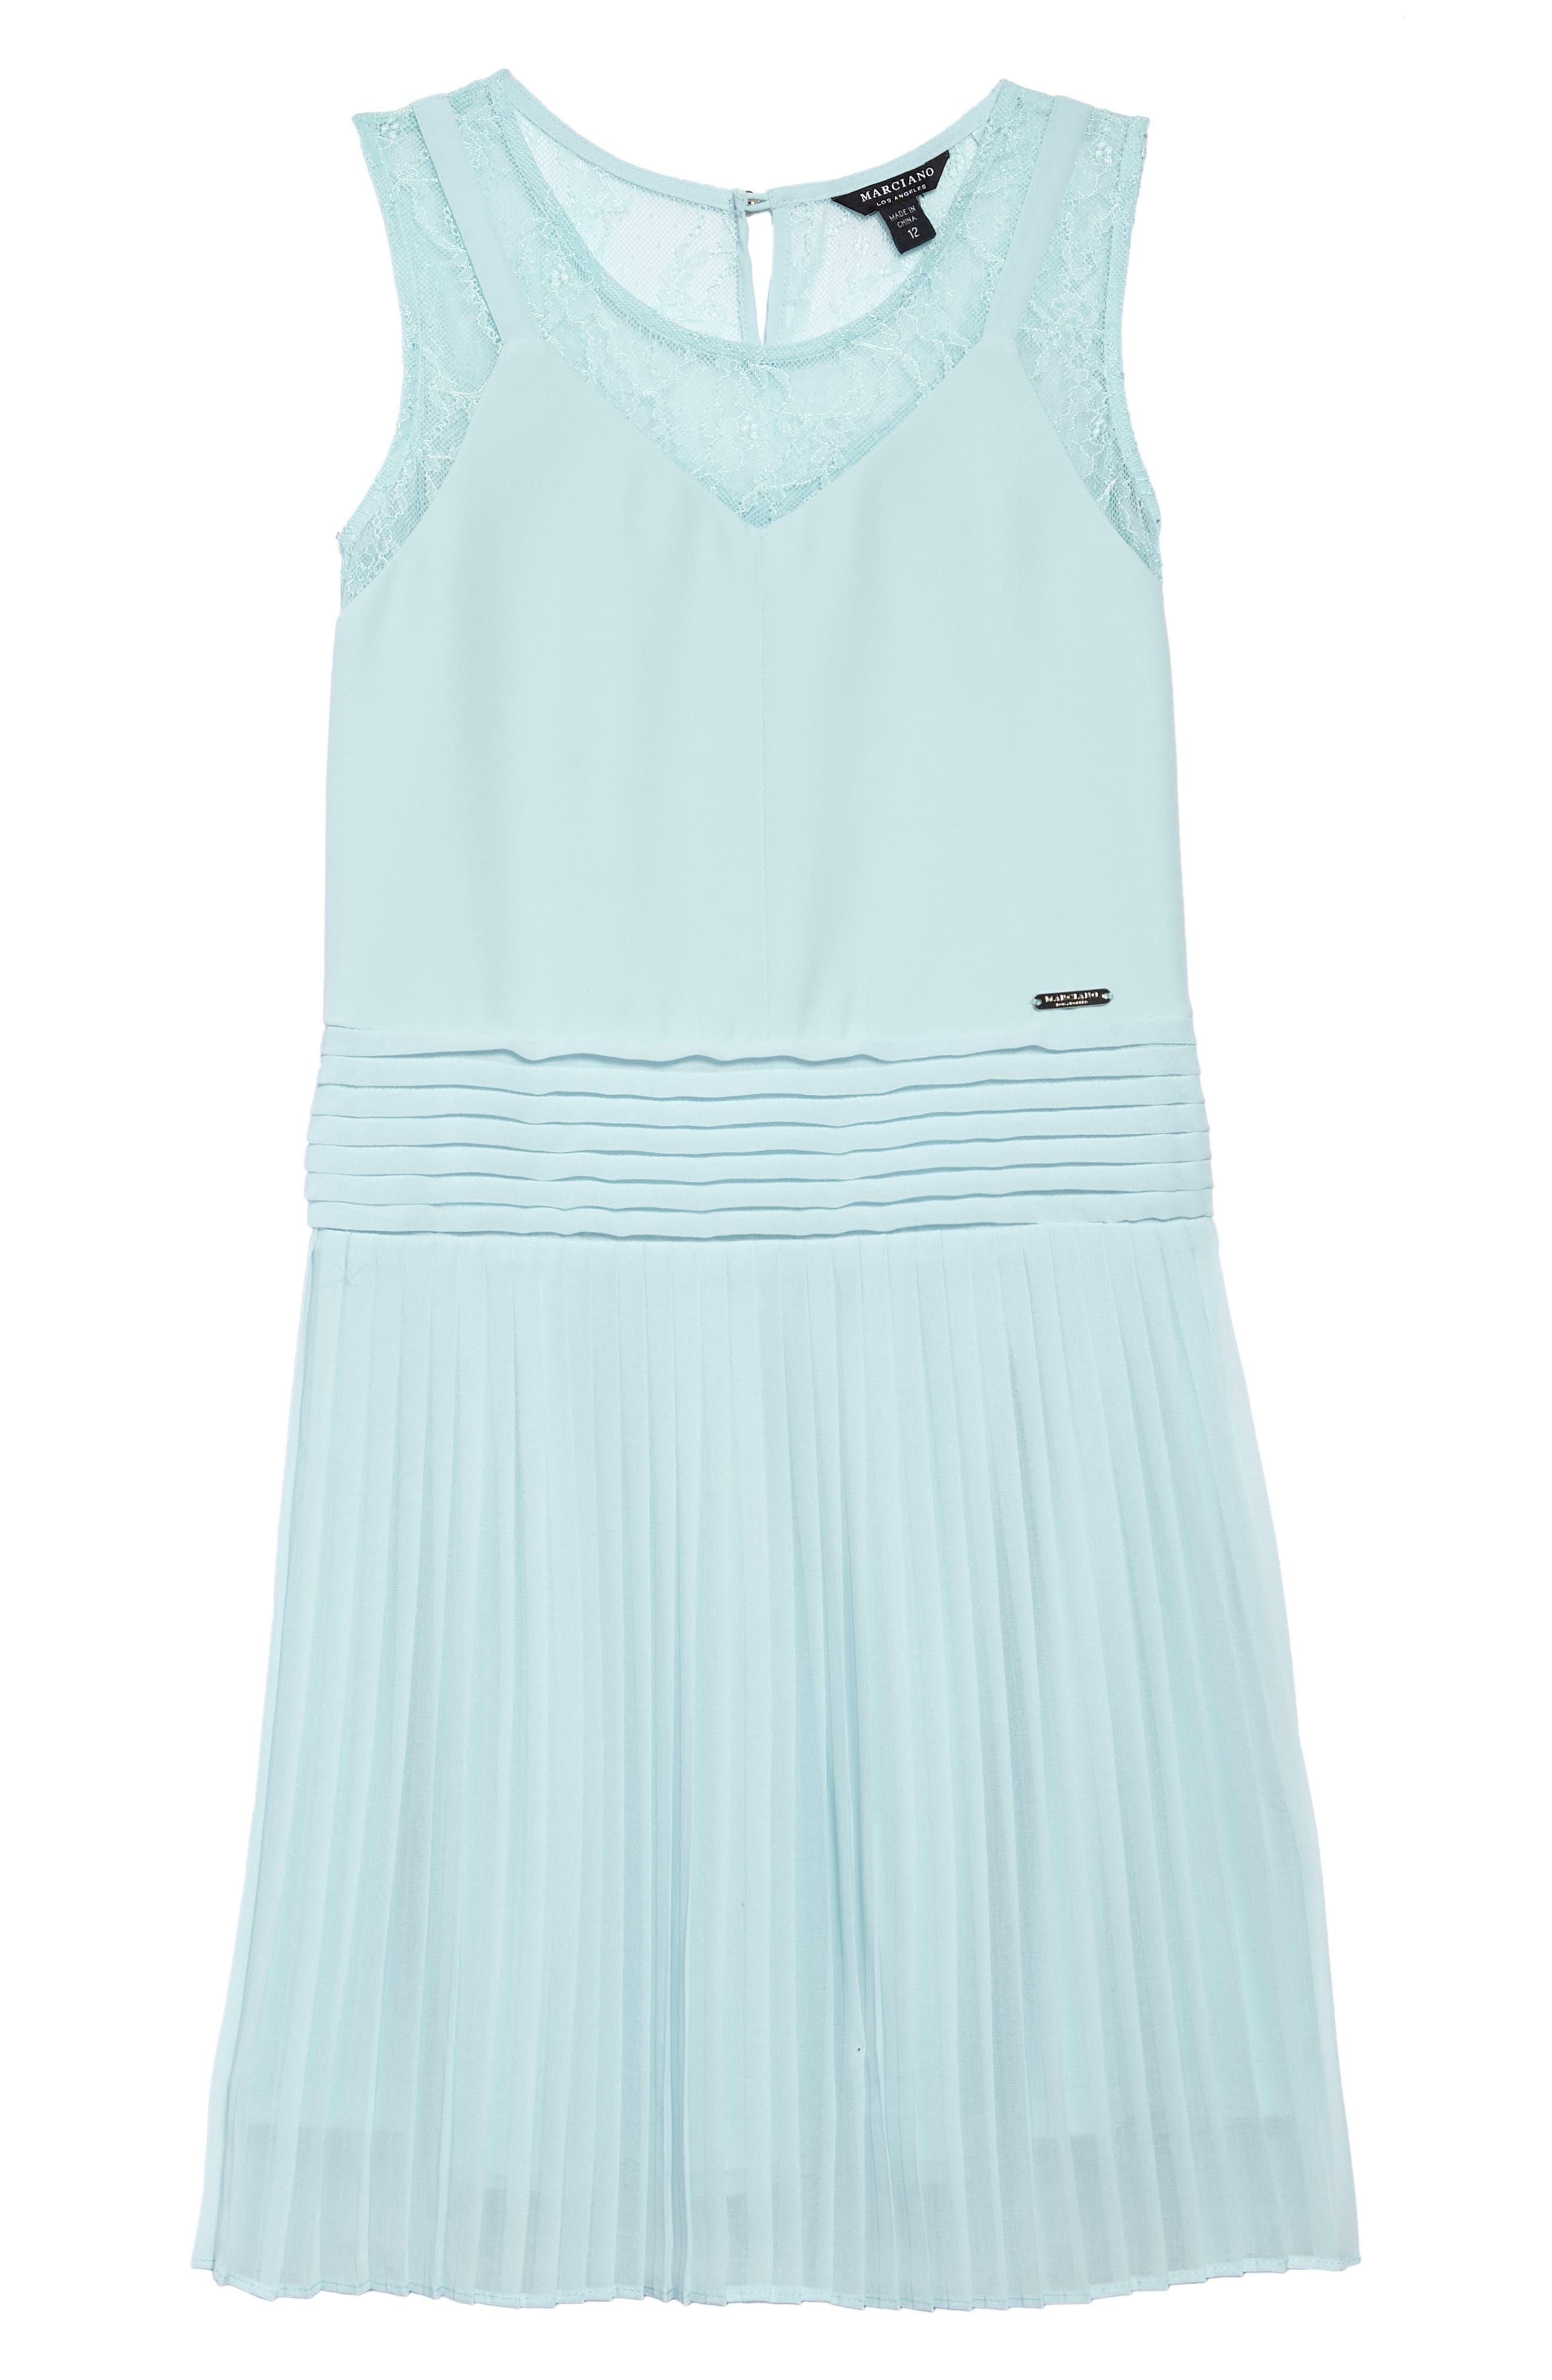 Pleated Chiffon Party Dress,                             Main thumbnail 1, color,                             Beau Blue